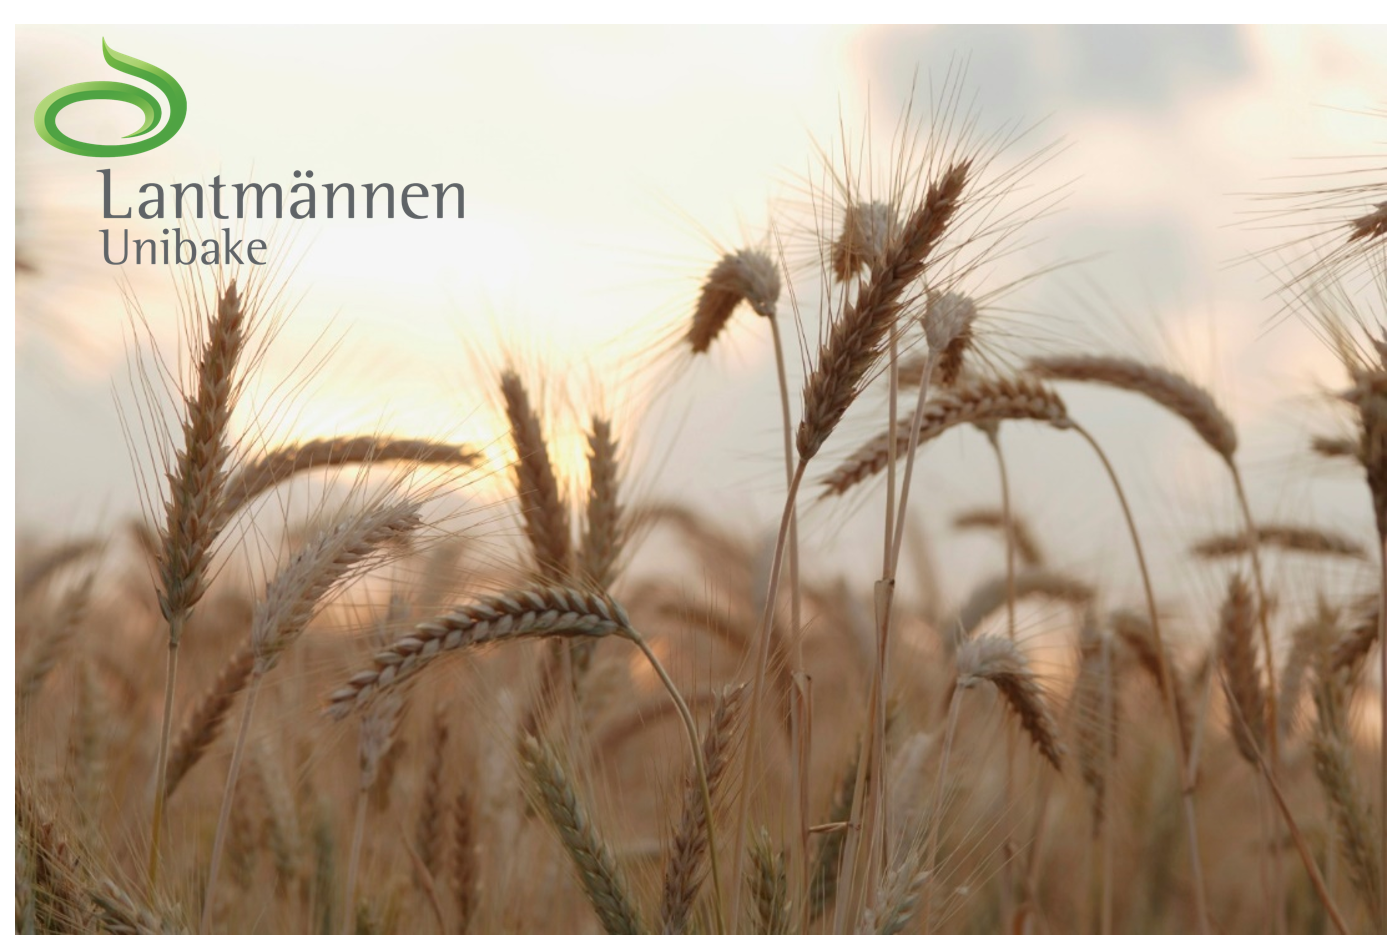 Lantmannen.png